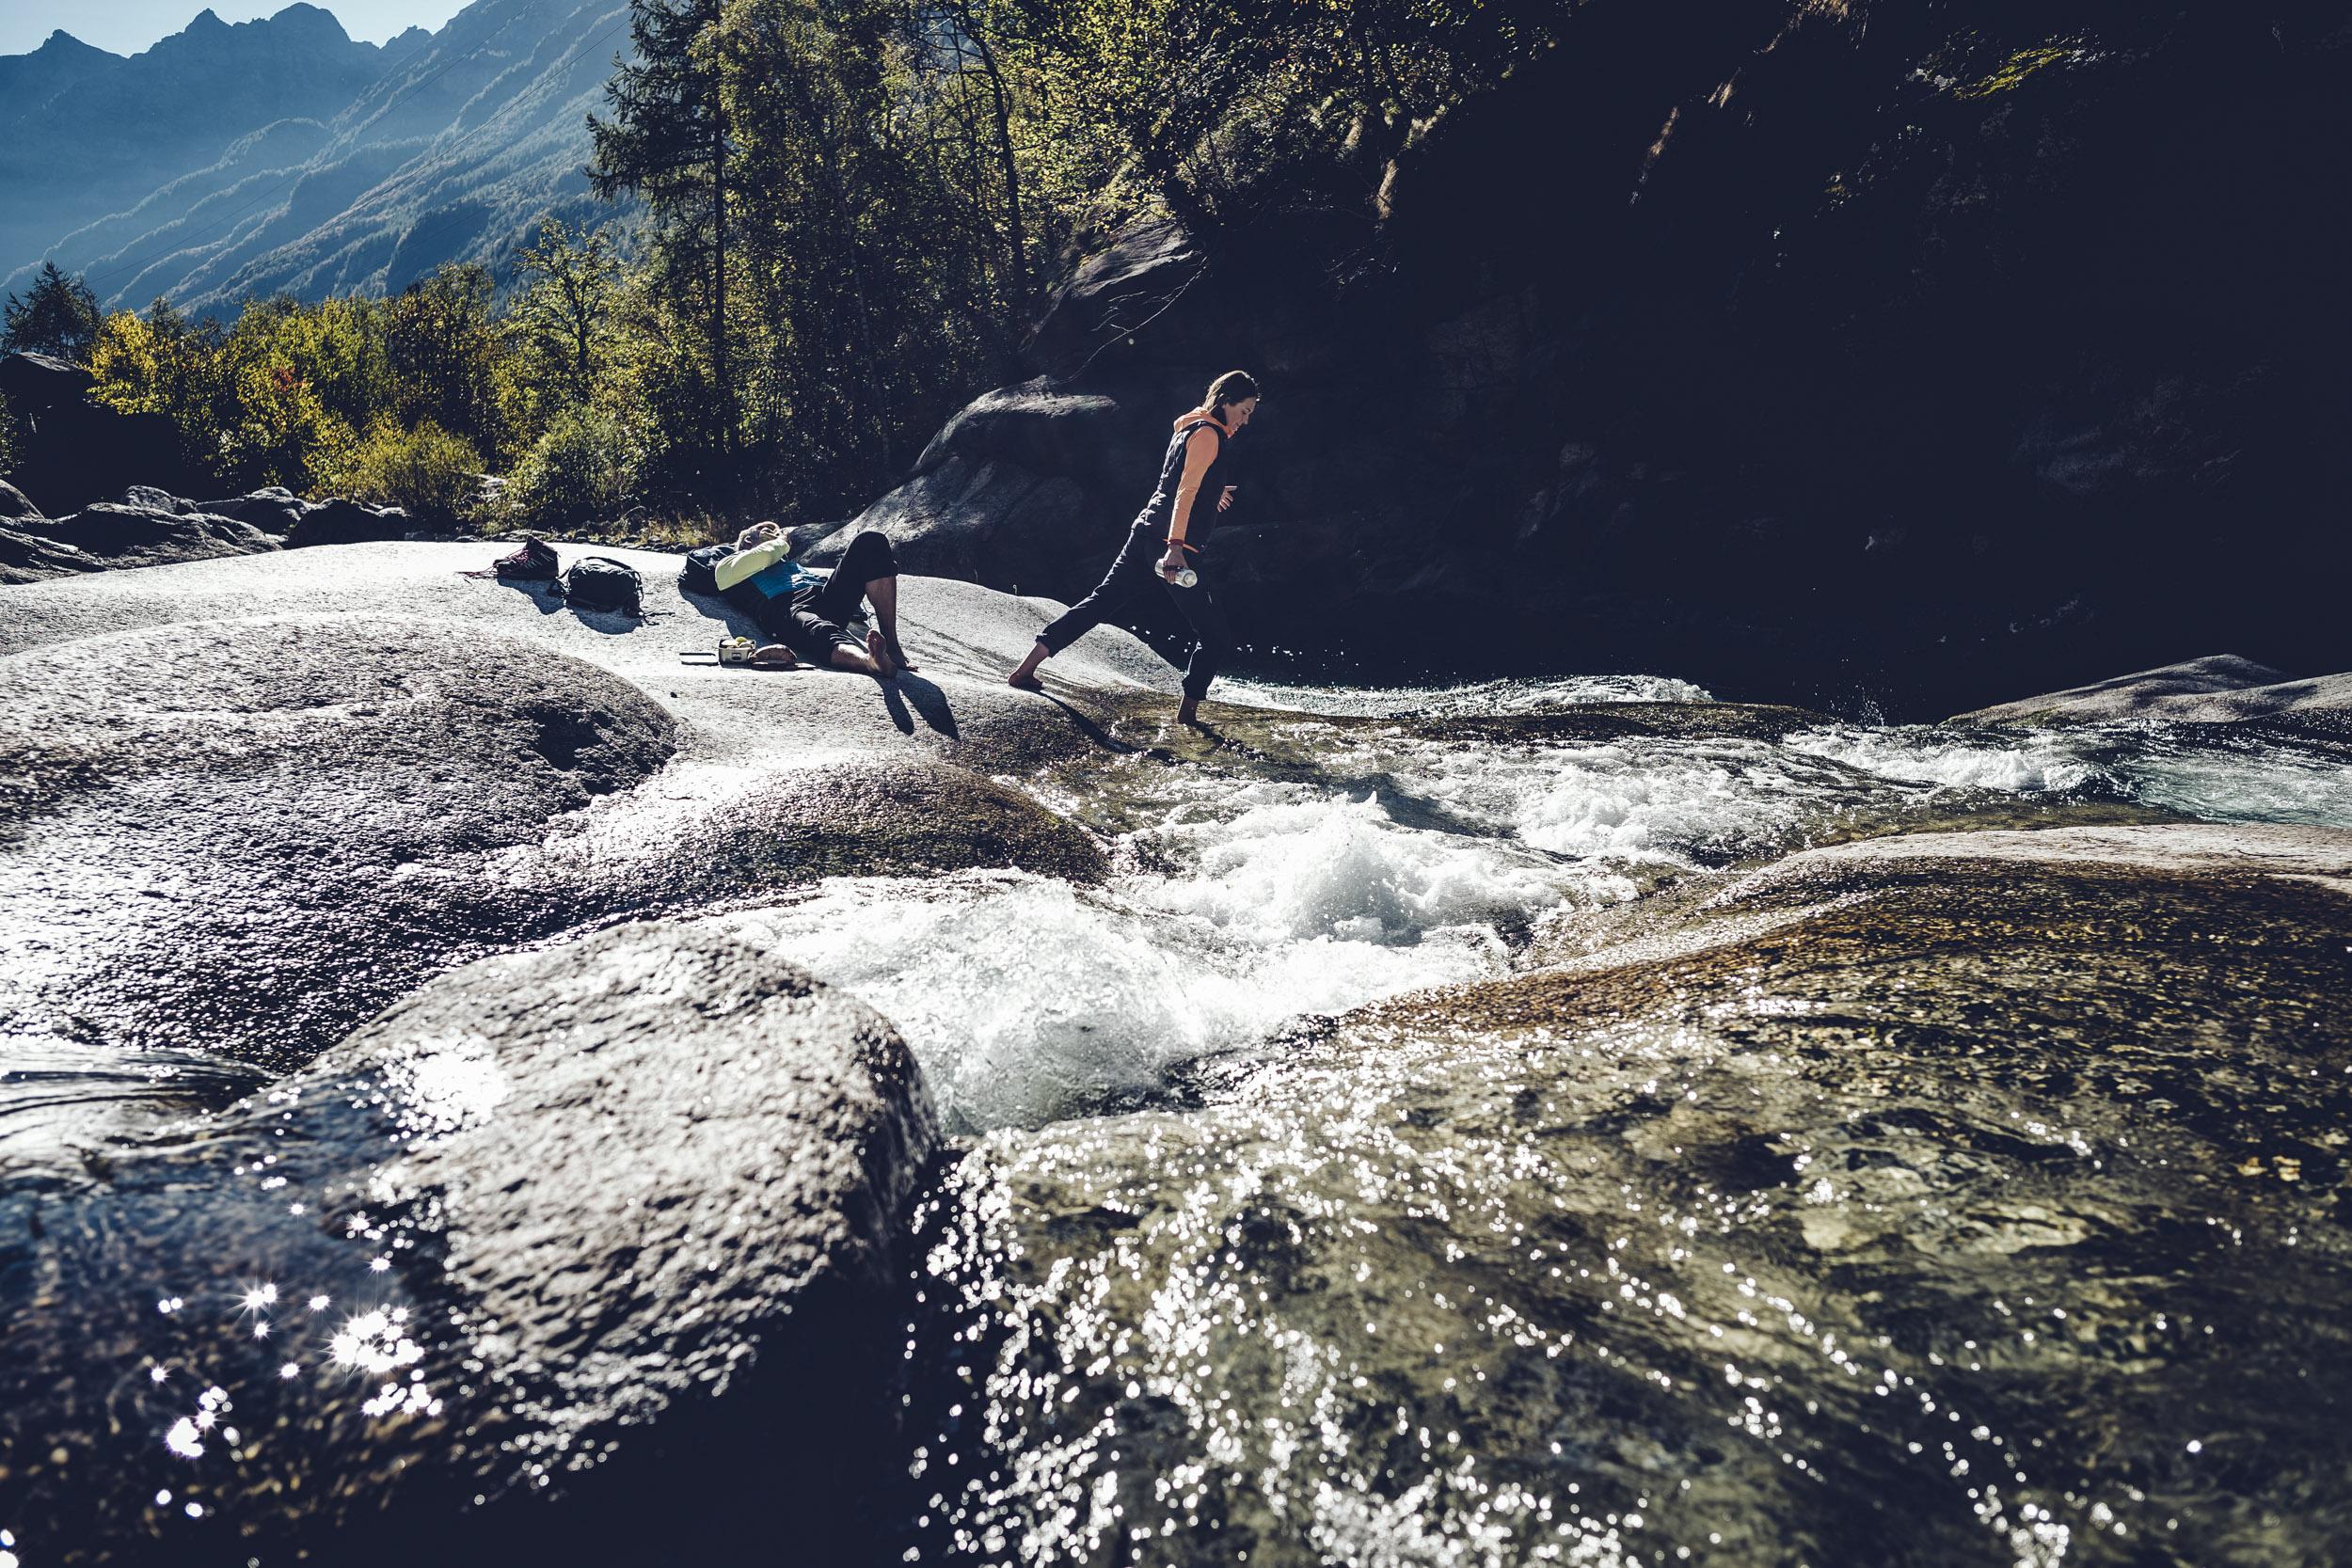 2019-SeifertUebler-luqel-outdoor-mountain-lifestyle008.jpg